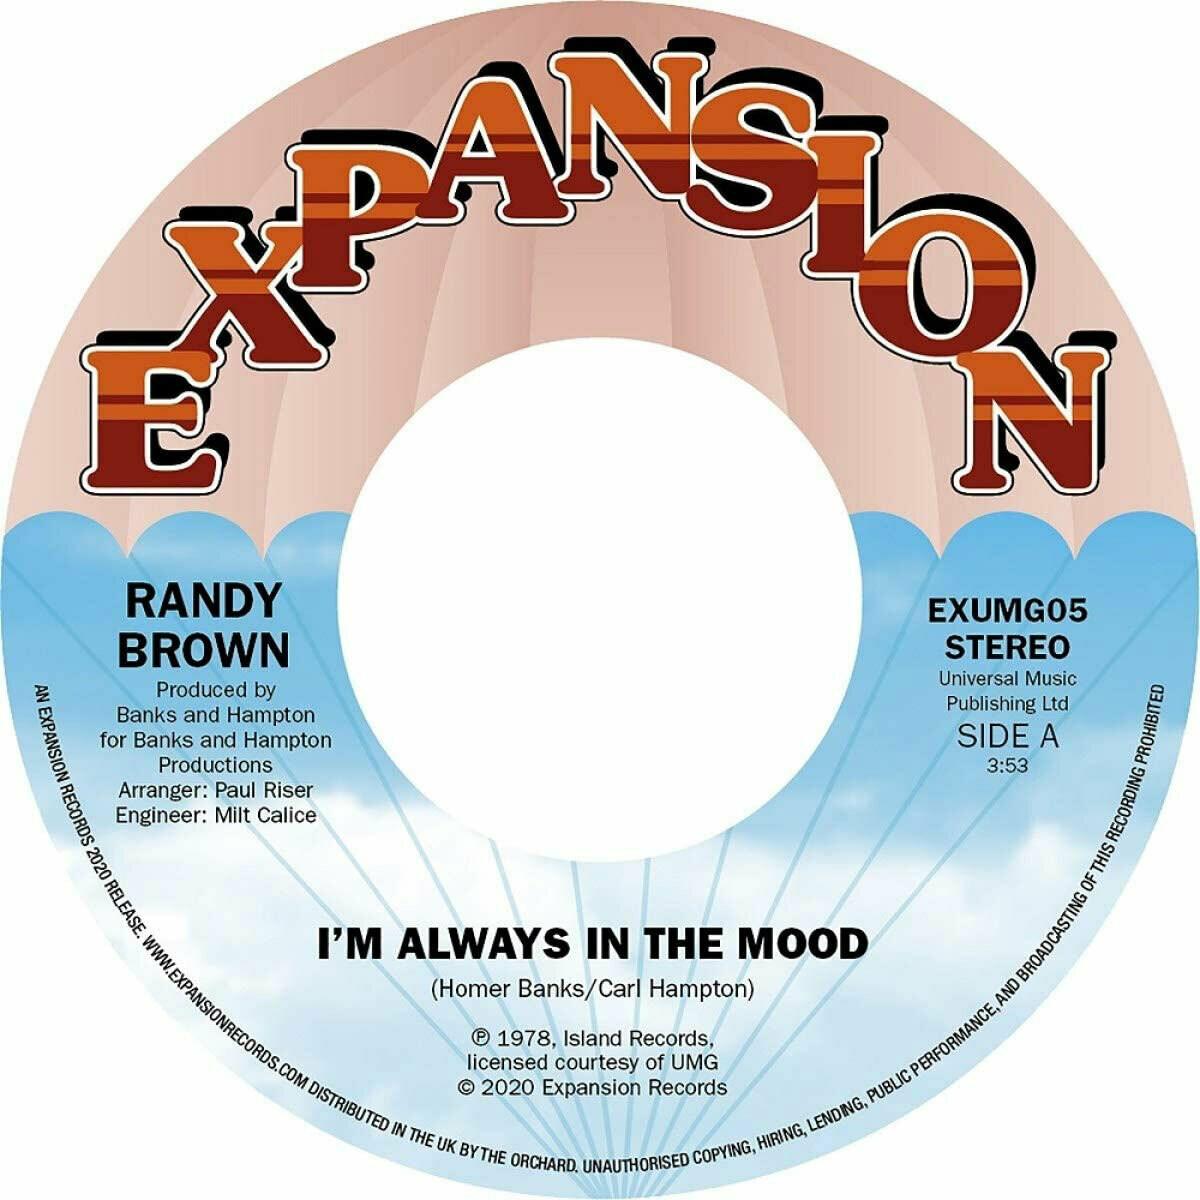 Randy Brown (45)